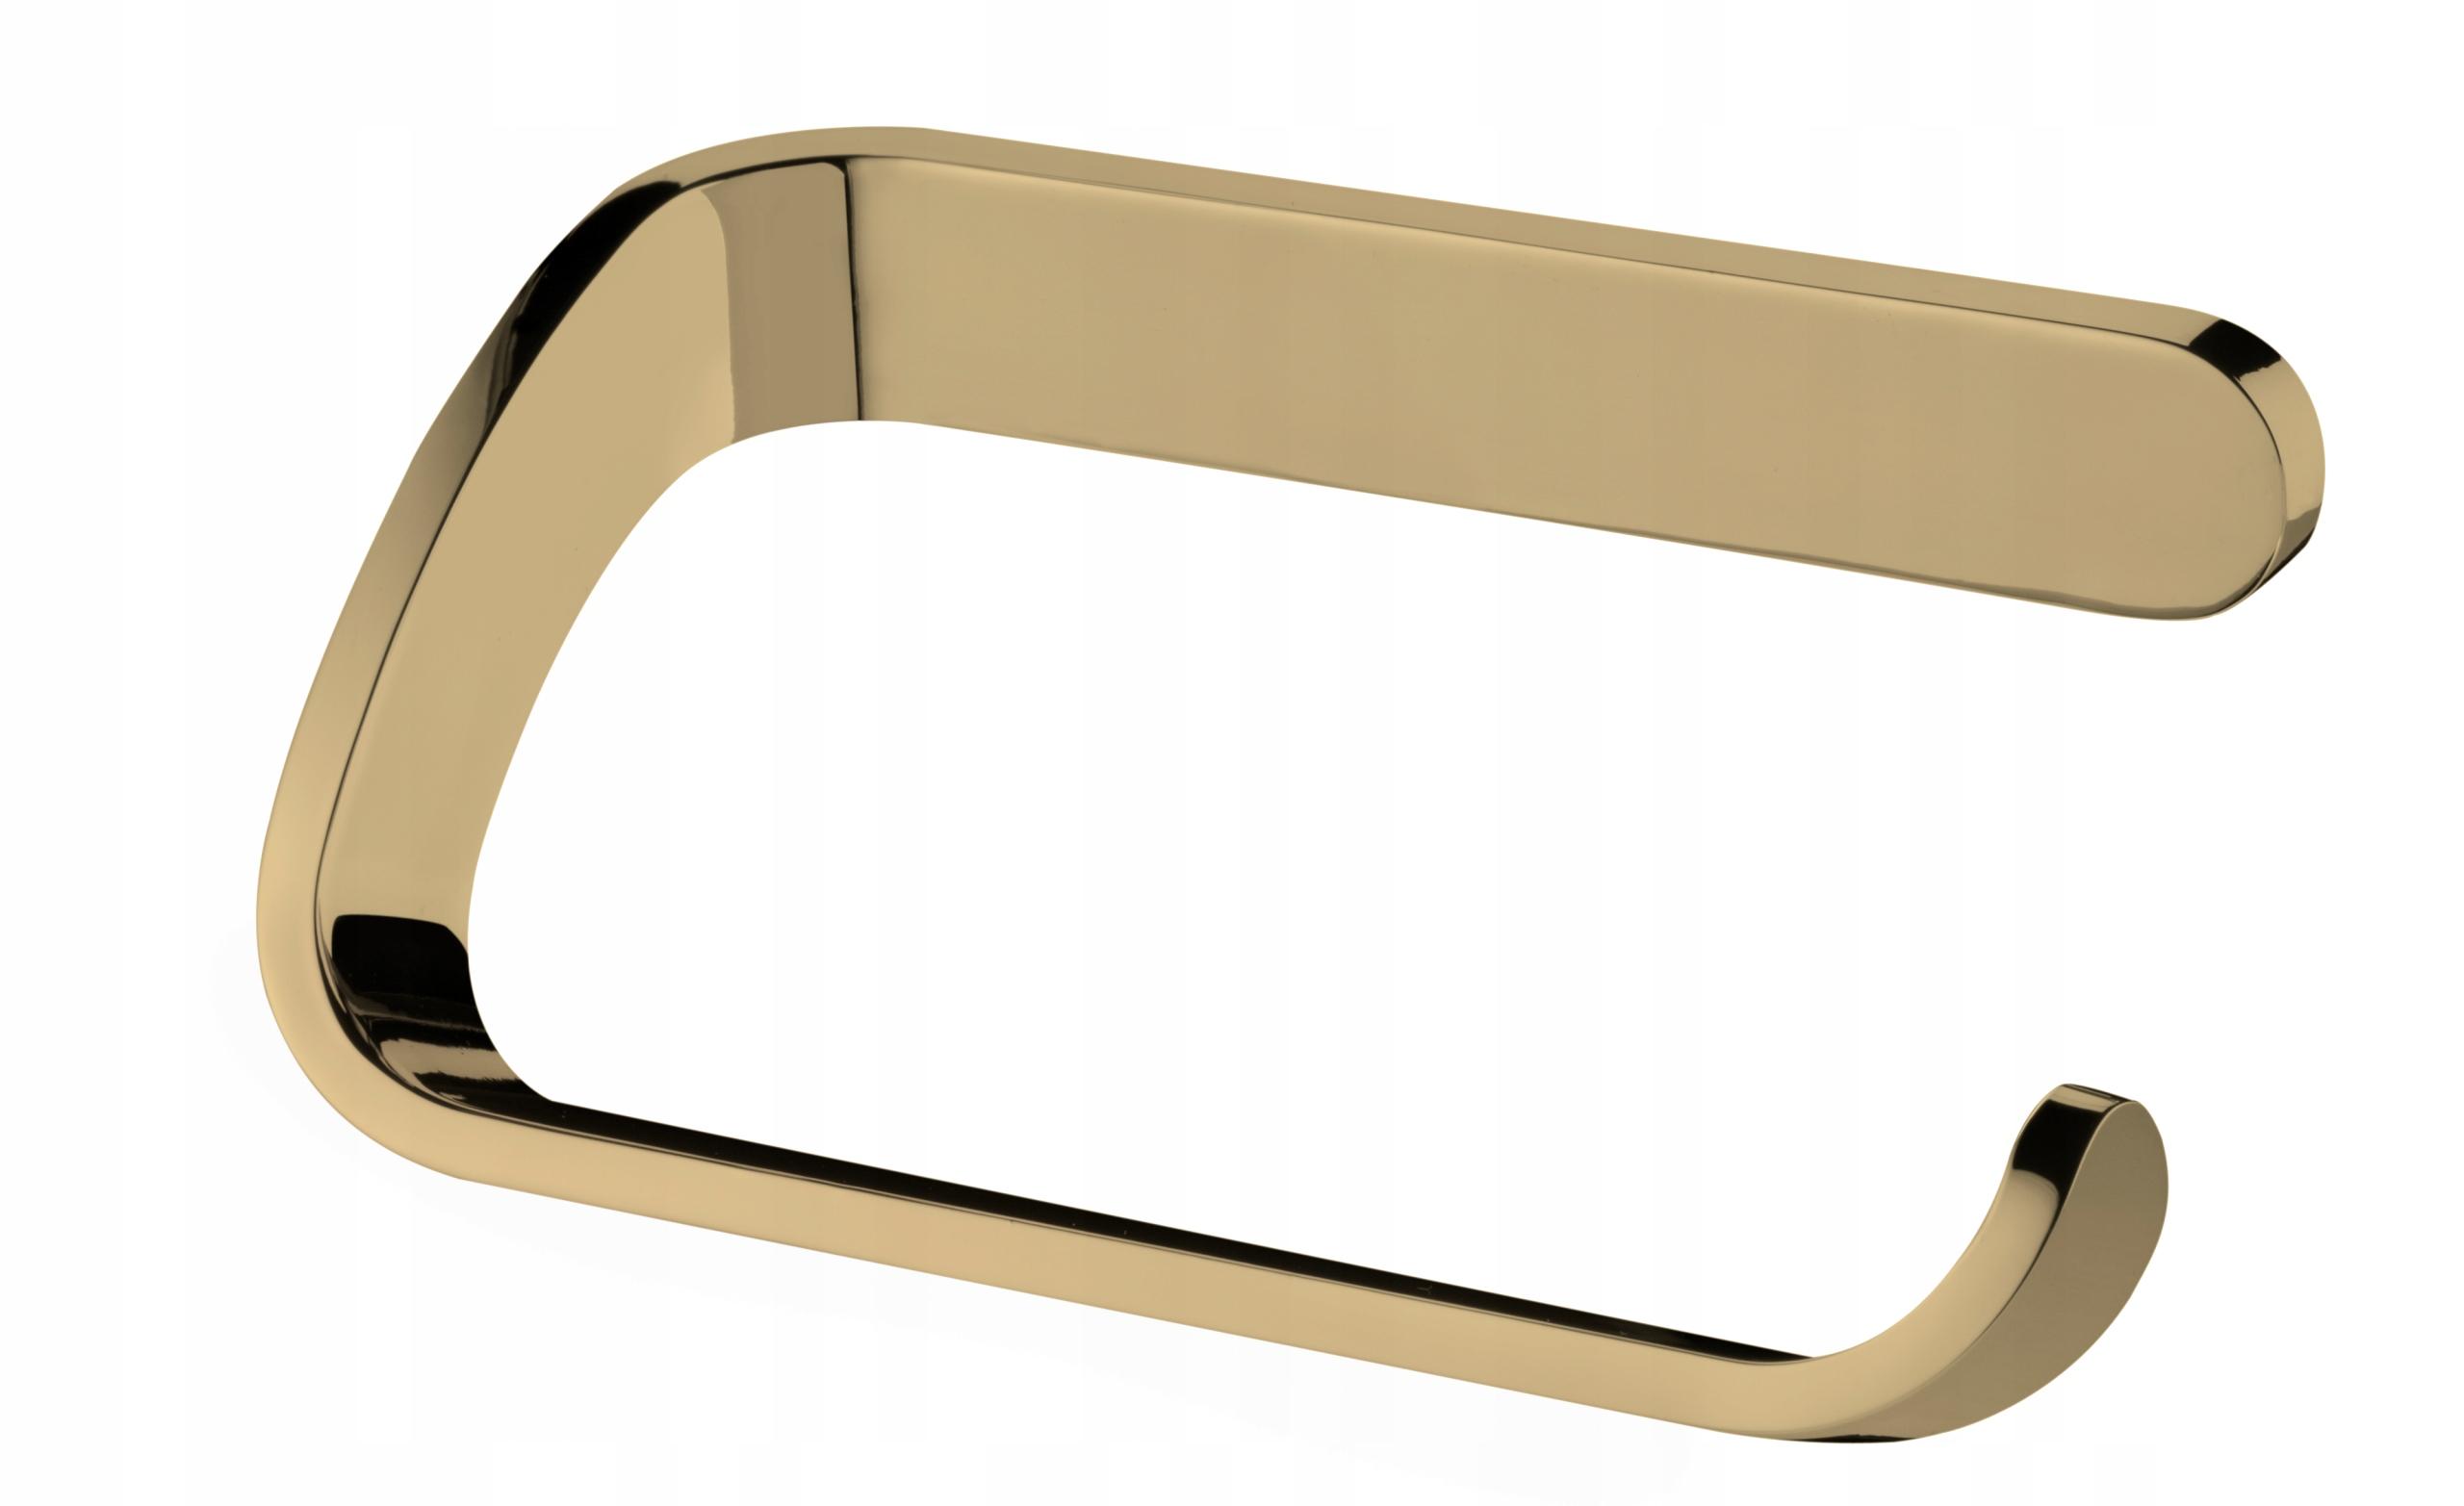 Držiak na toaletný papier Simple Gold zo zlata